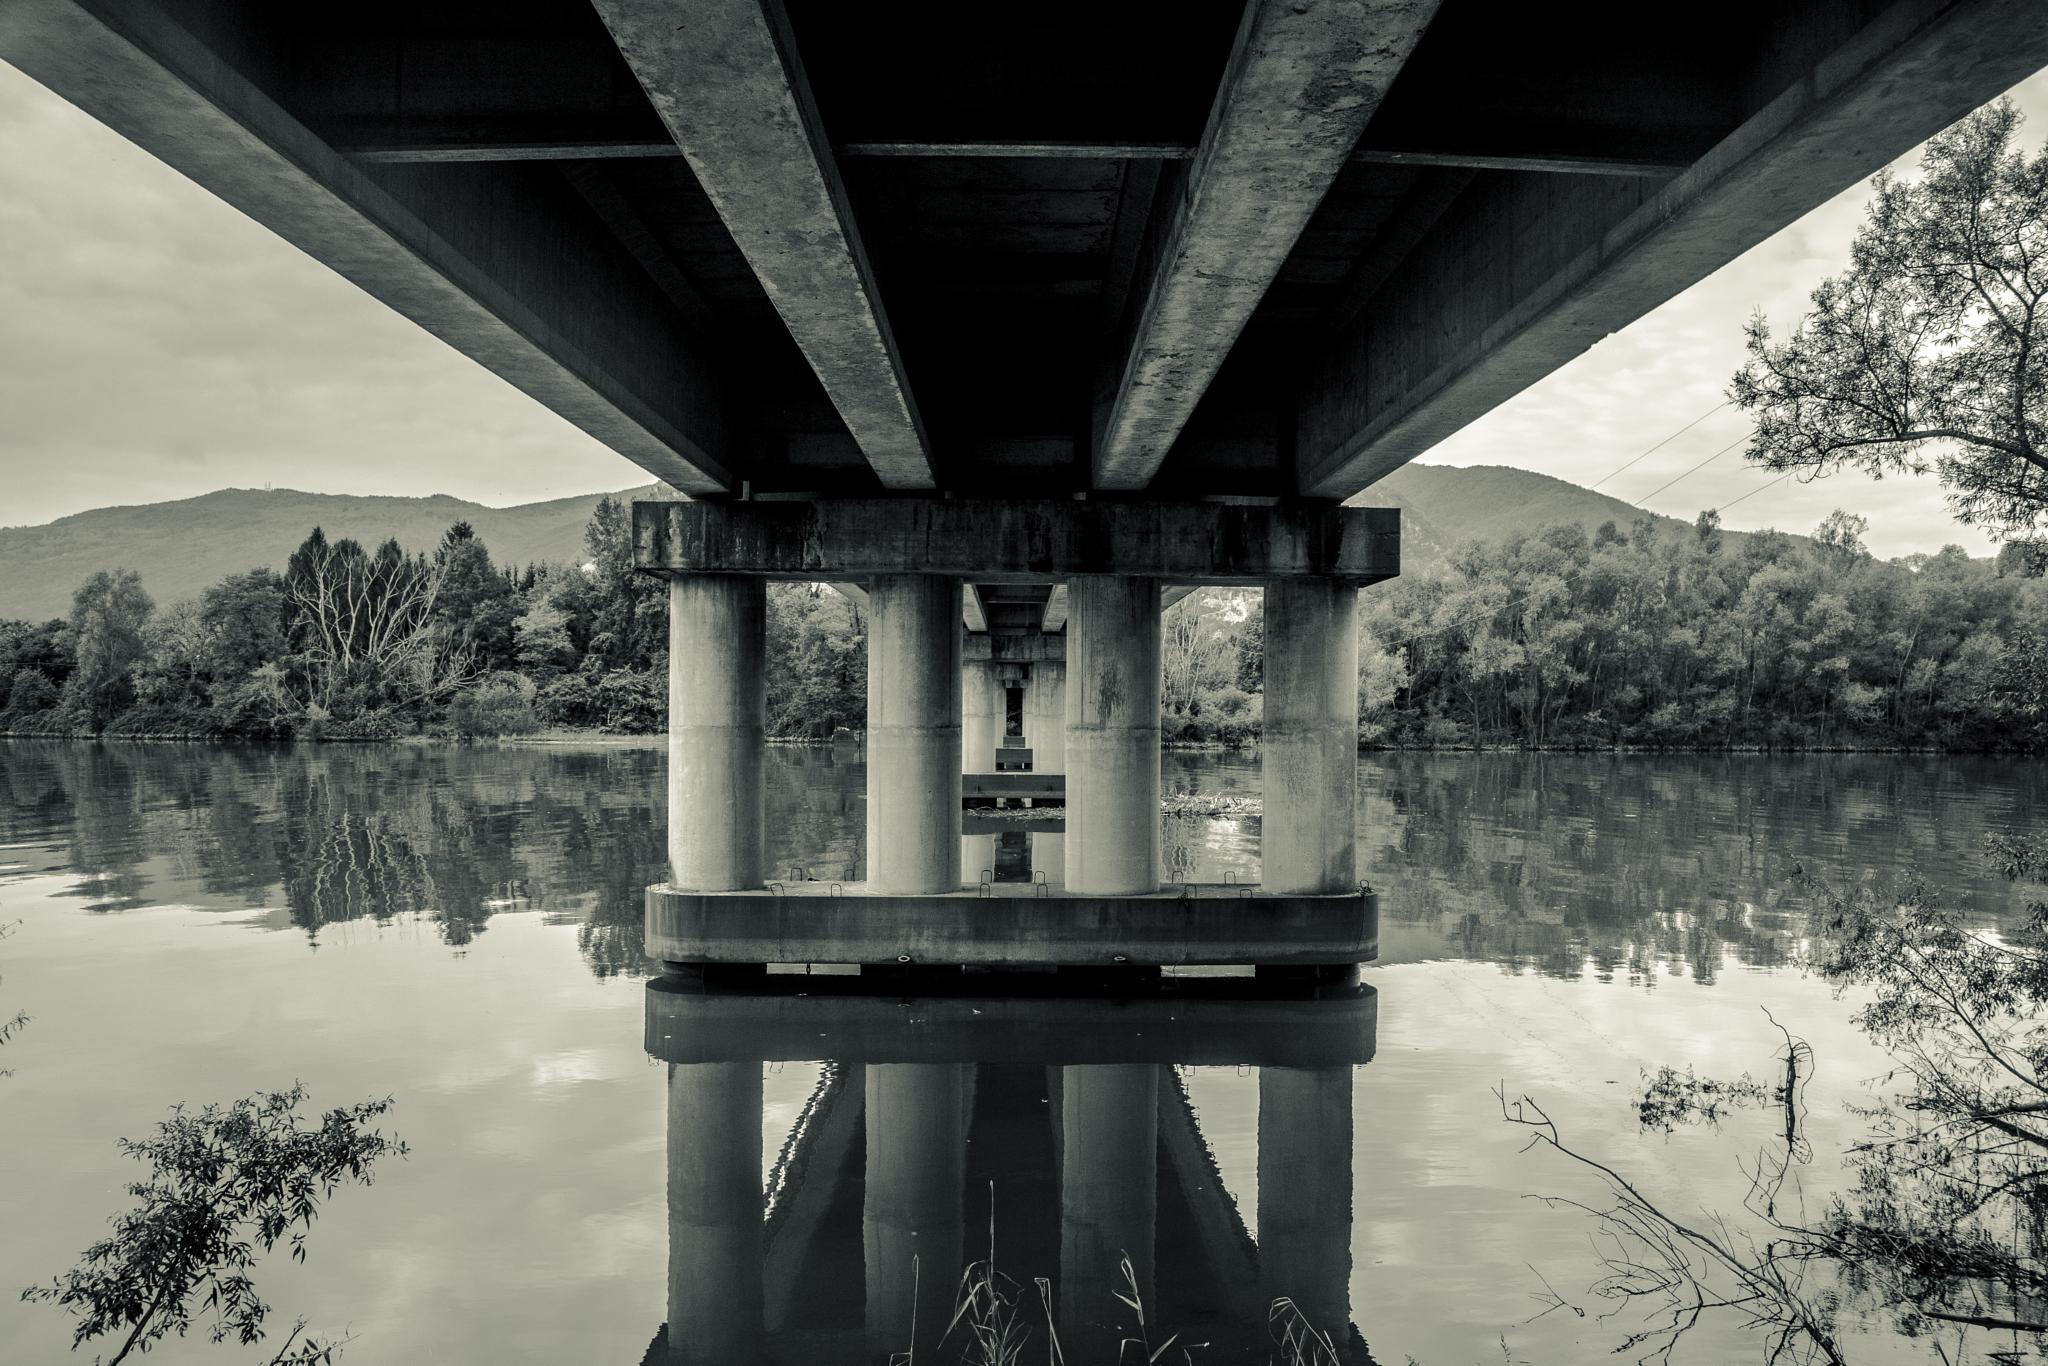 Under the Bridge by claudioturrin77